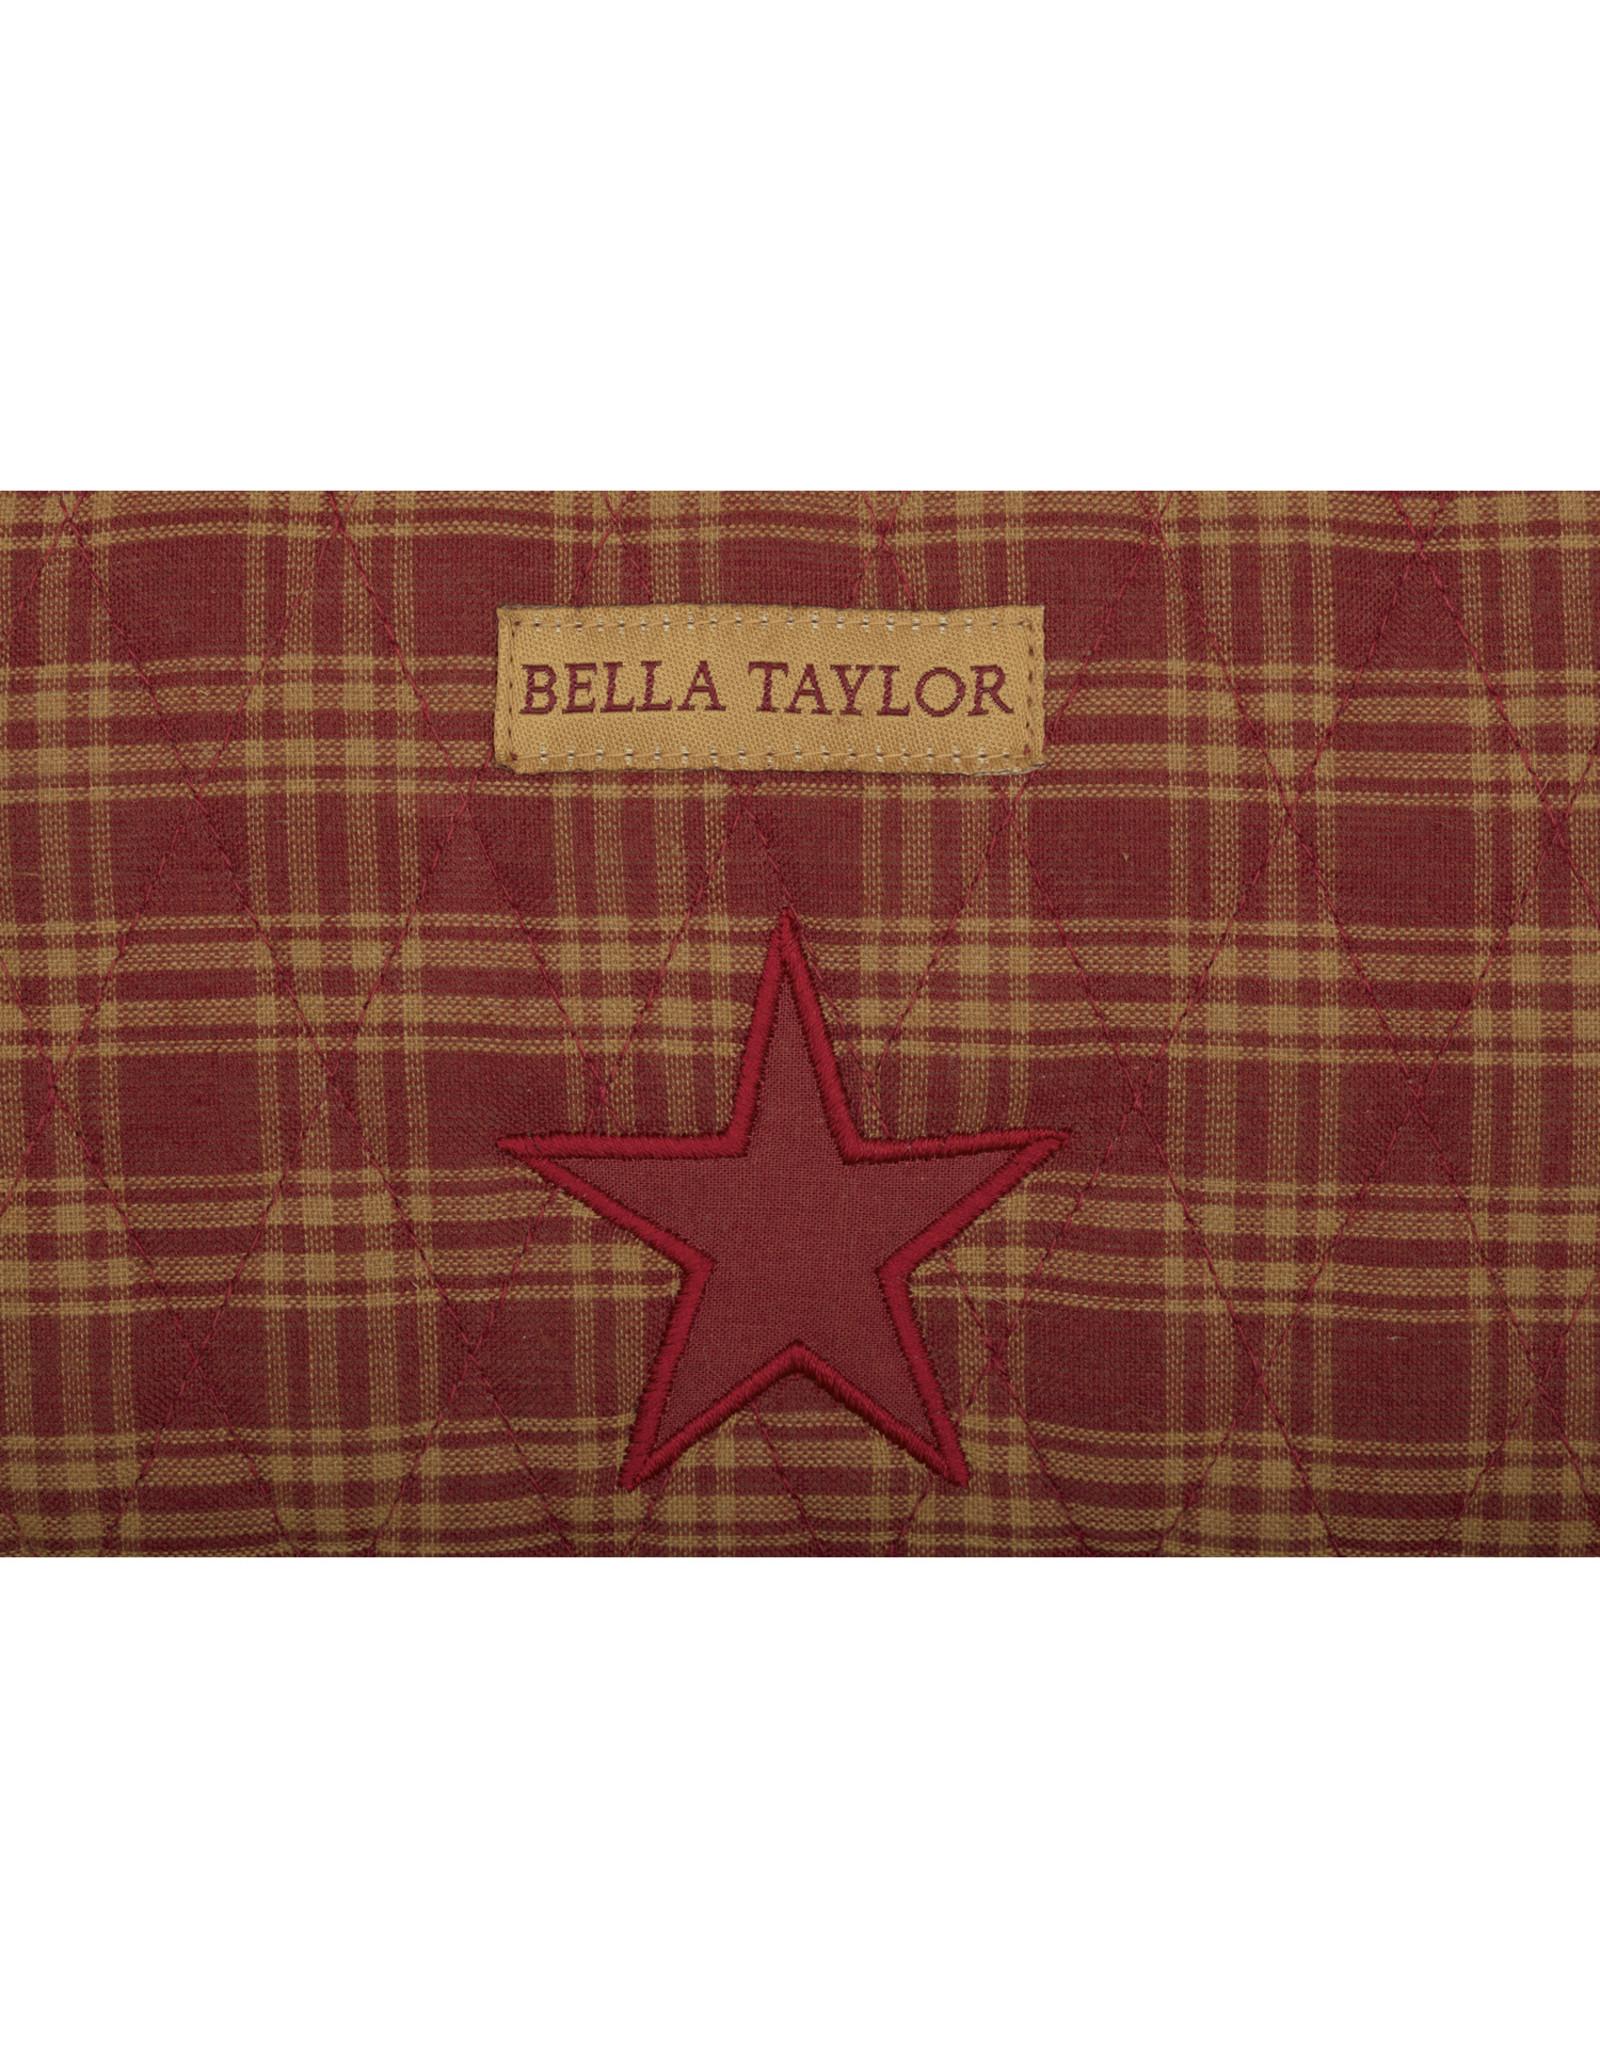 Bella Taylor Ninepatch Star - Wrist Strap Wallet